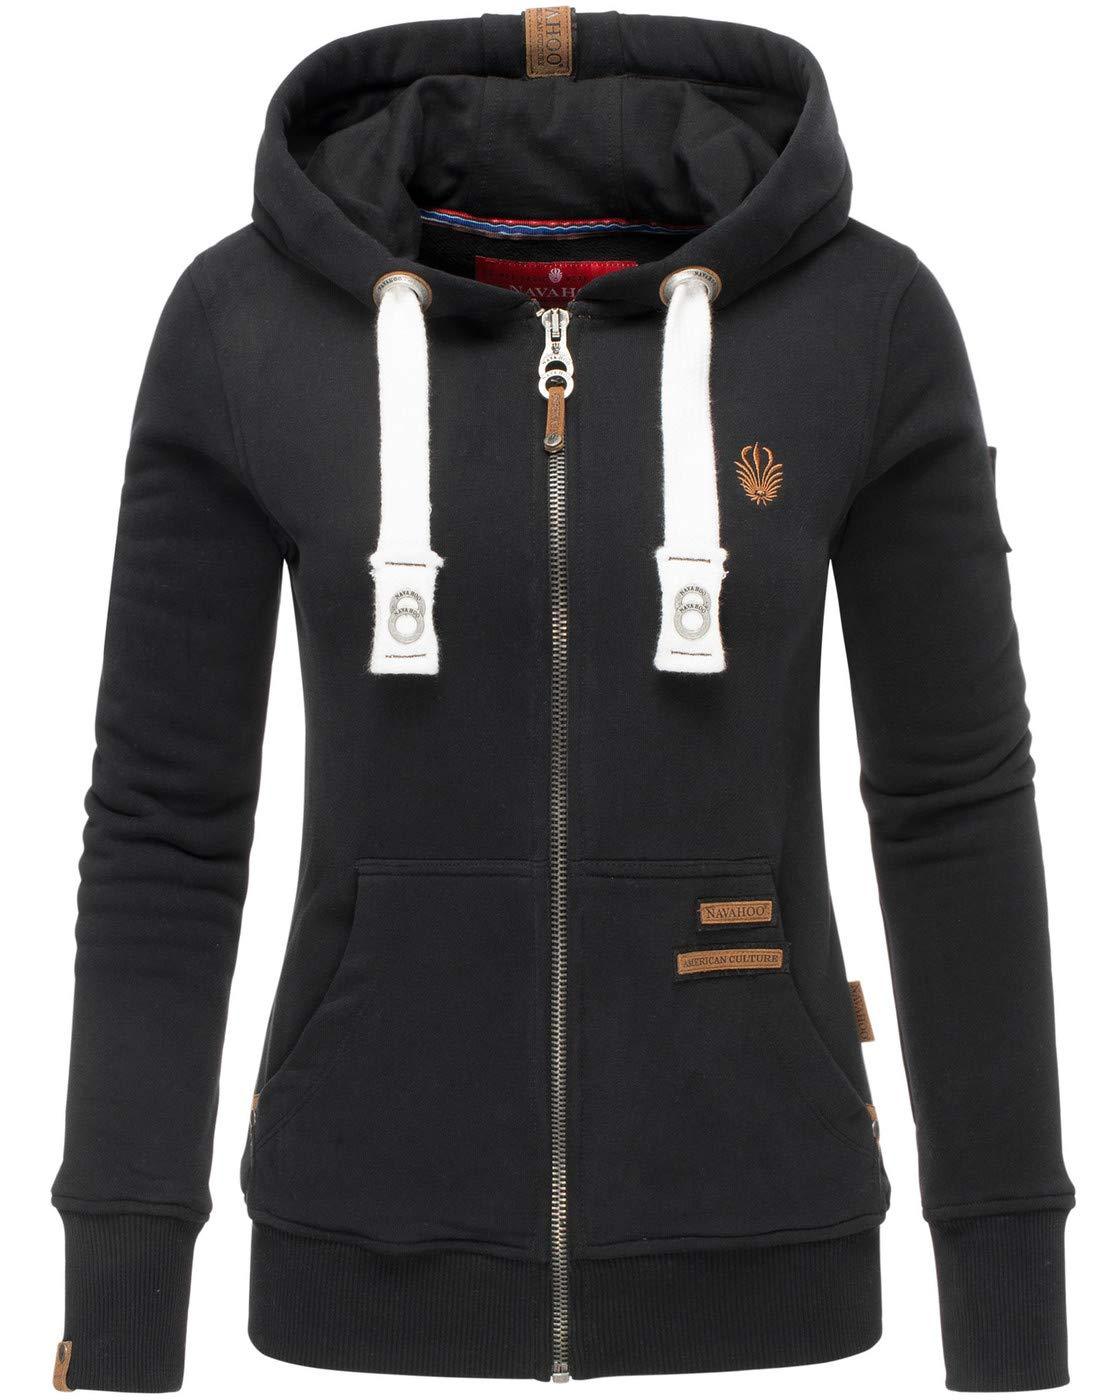 Navahoo Damen Sweatshirt Hoodie Pullover Pulli Sweater Sweatjacke Kapuze B564